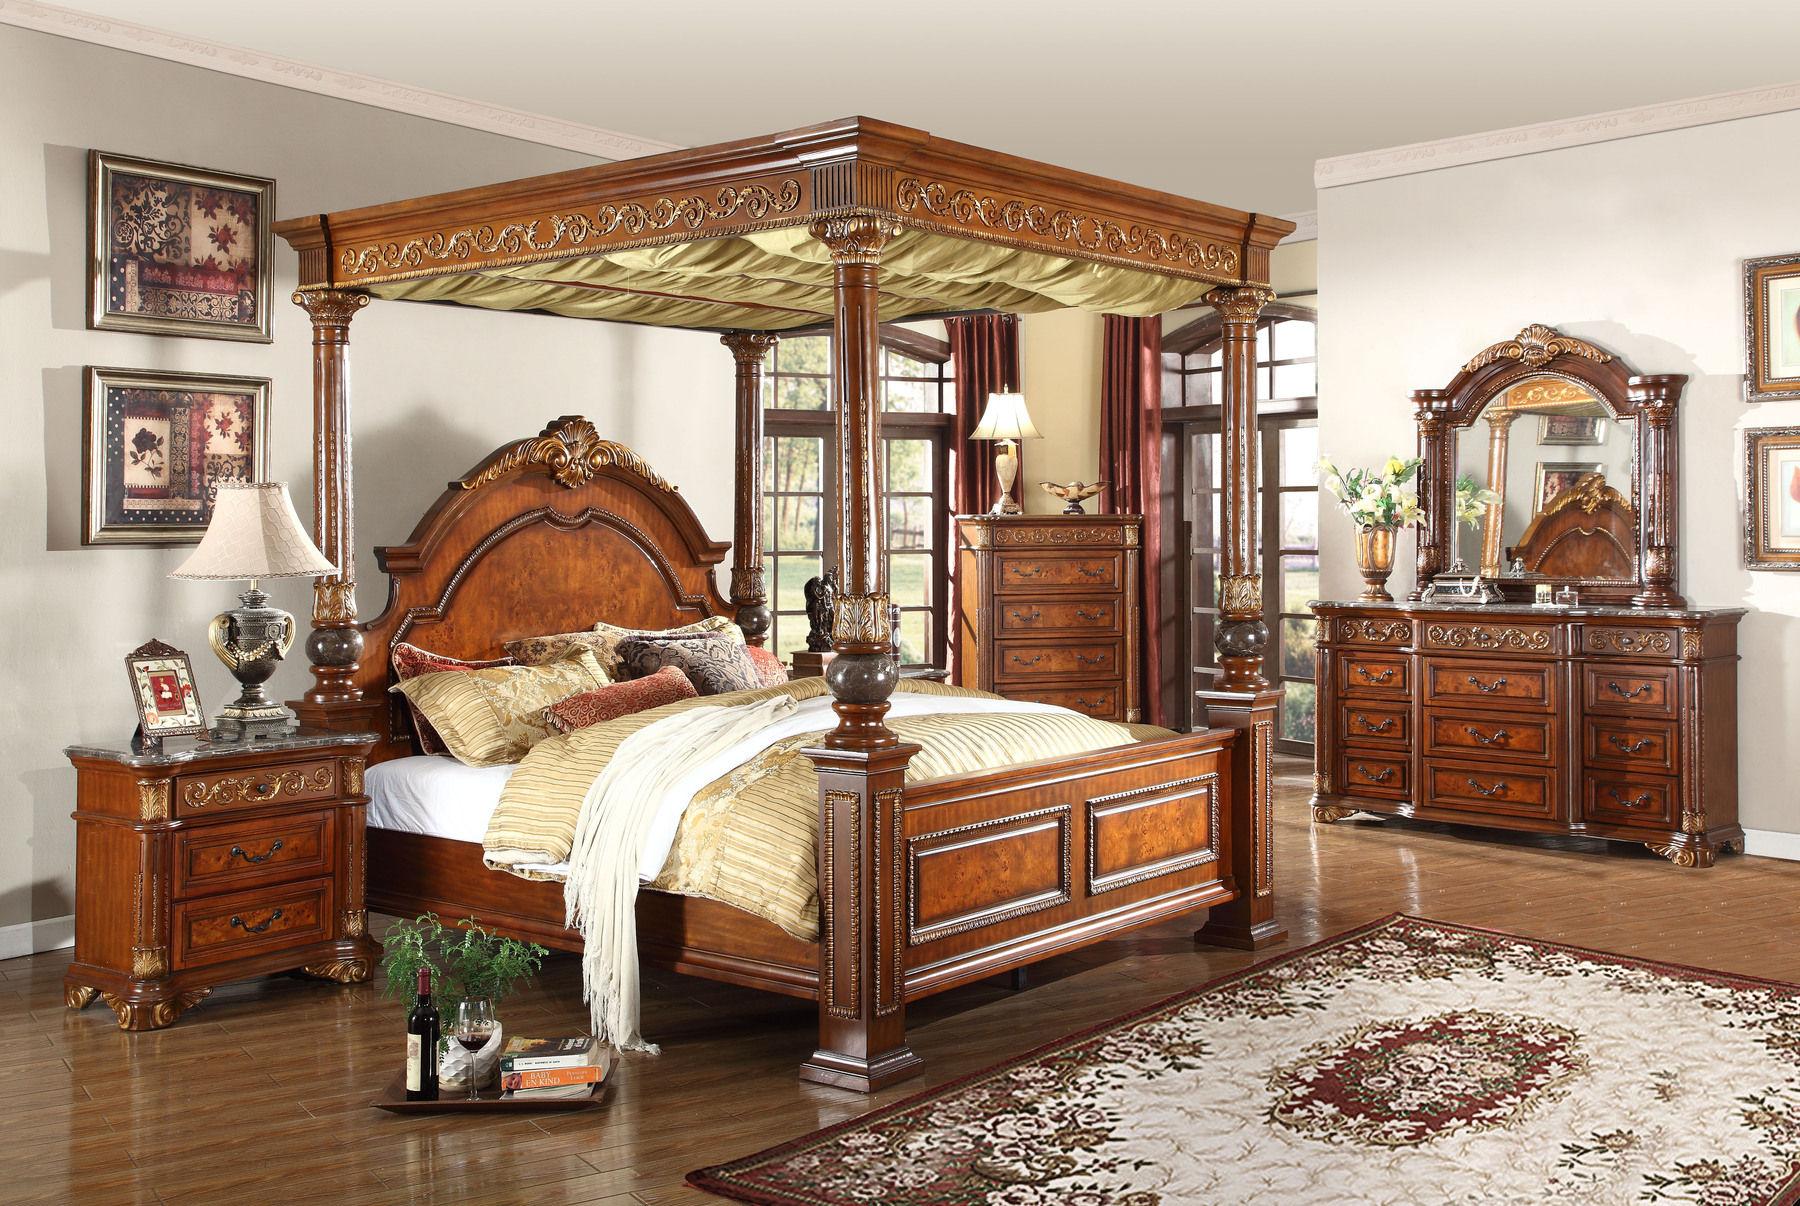 royal bedroom sets - HD1800×1206